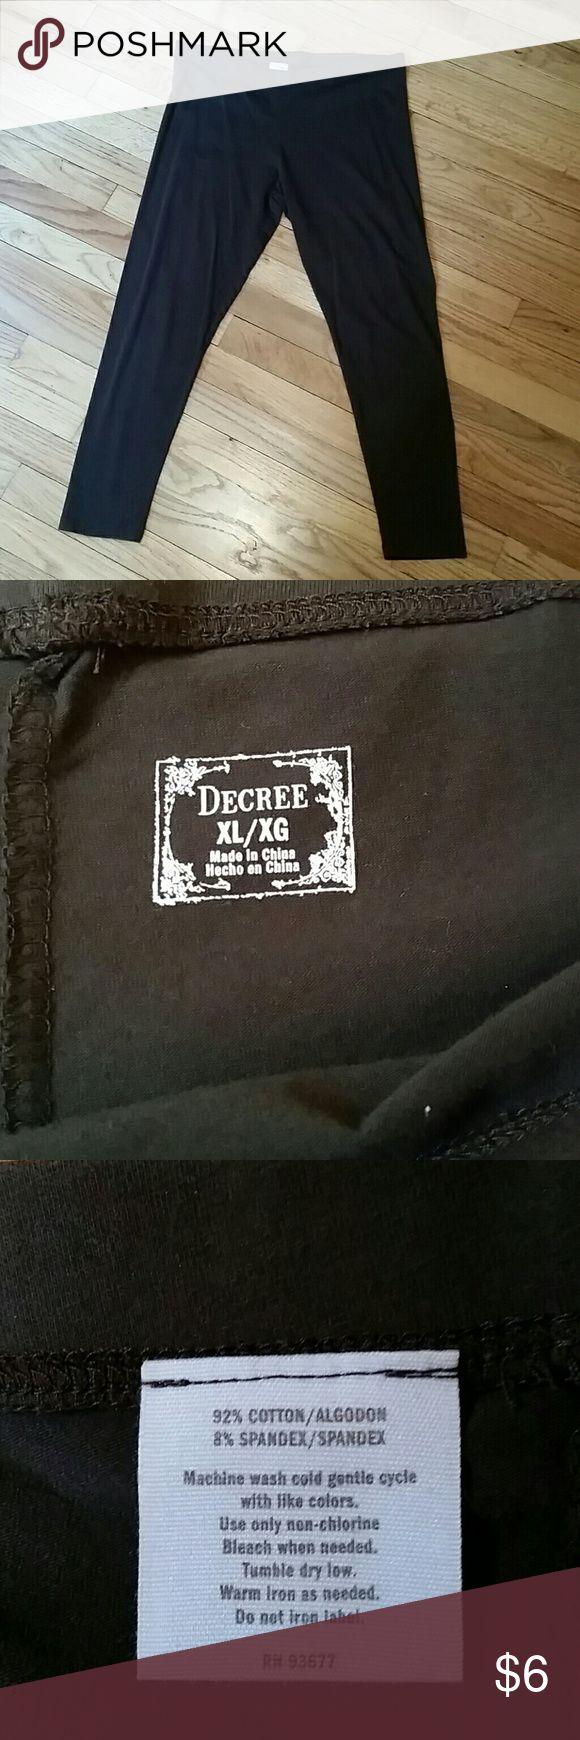 Decree Chocolate Brown Leggings EUC Chocolate brown leggings, 92% cotton, 8% spandex. Length is 33 inches. Worn only one time, EUC. Decree Pants Leggings